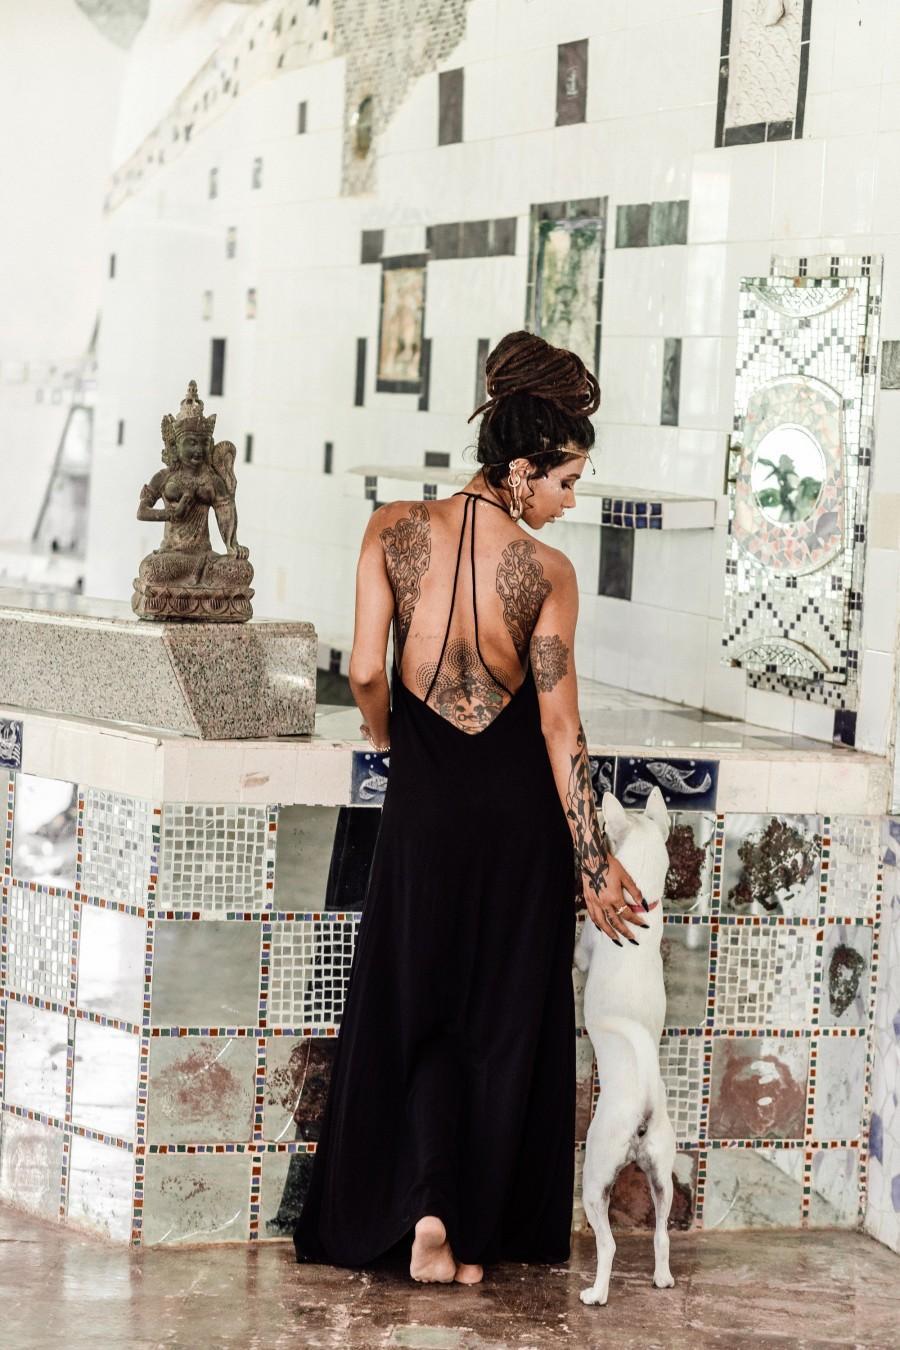 Свадьба - Black Wedding Dress • Boho Dress • Organic Bohemian Dress • Sleeveless Party Dress • Prom Dress • Evening Dress •  Black Dresses for Women